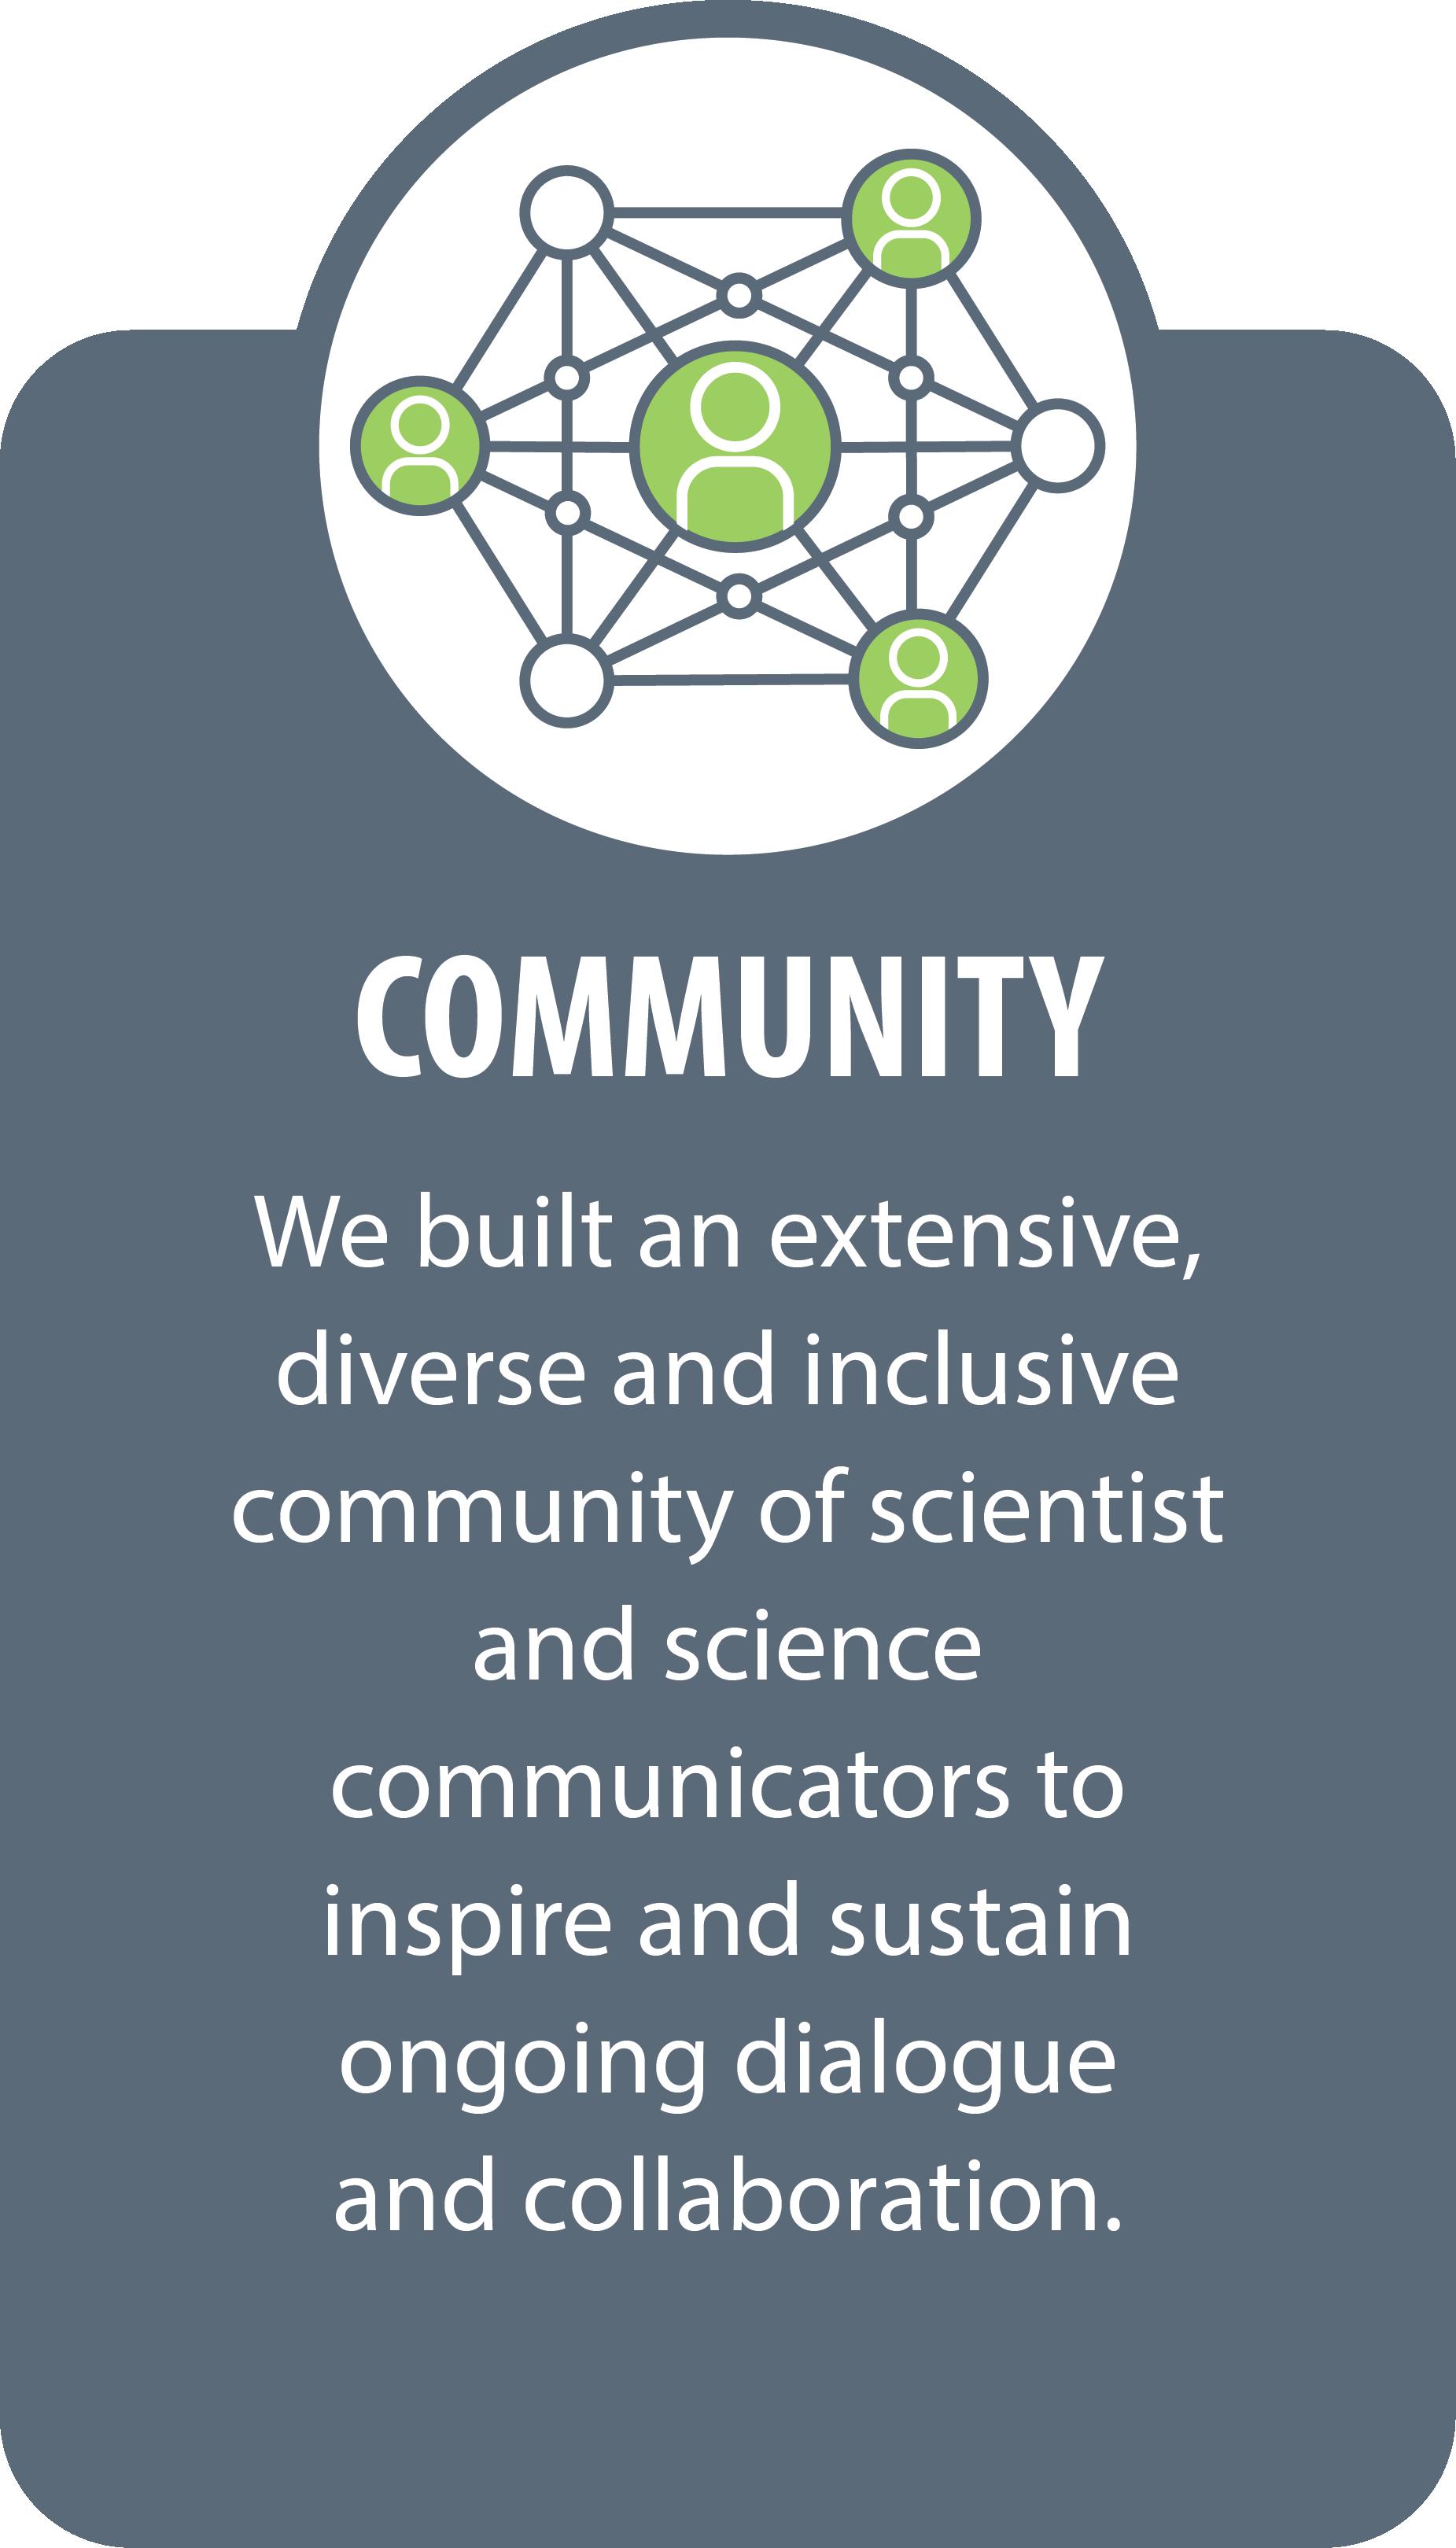 5. Community